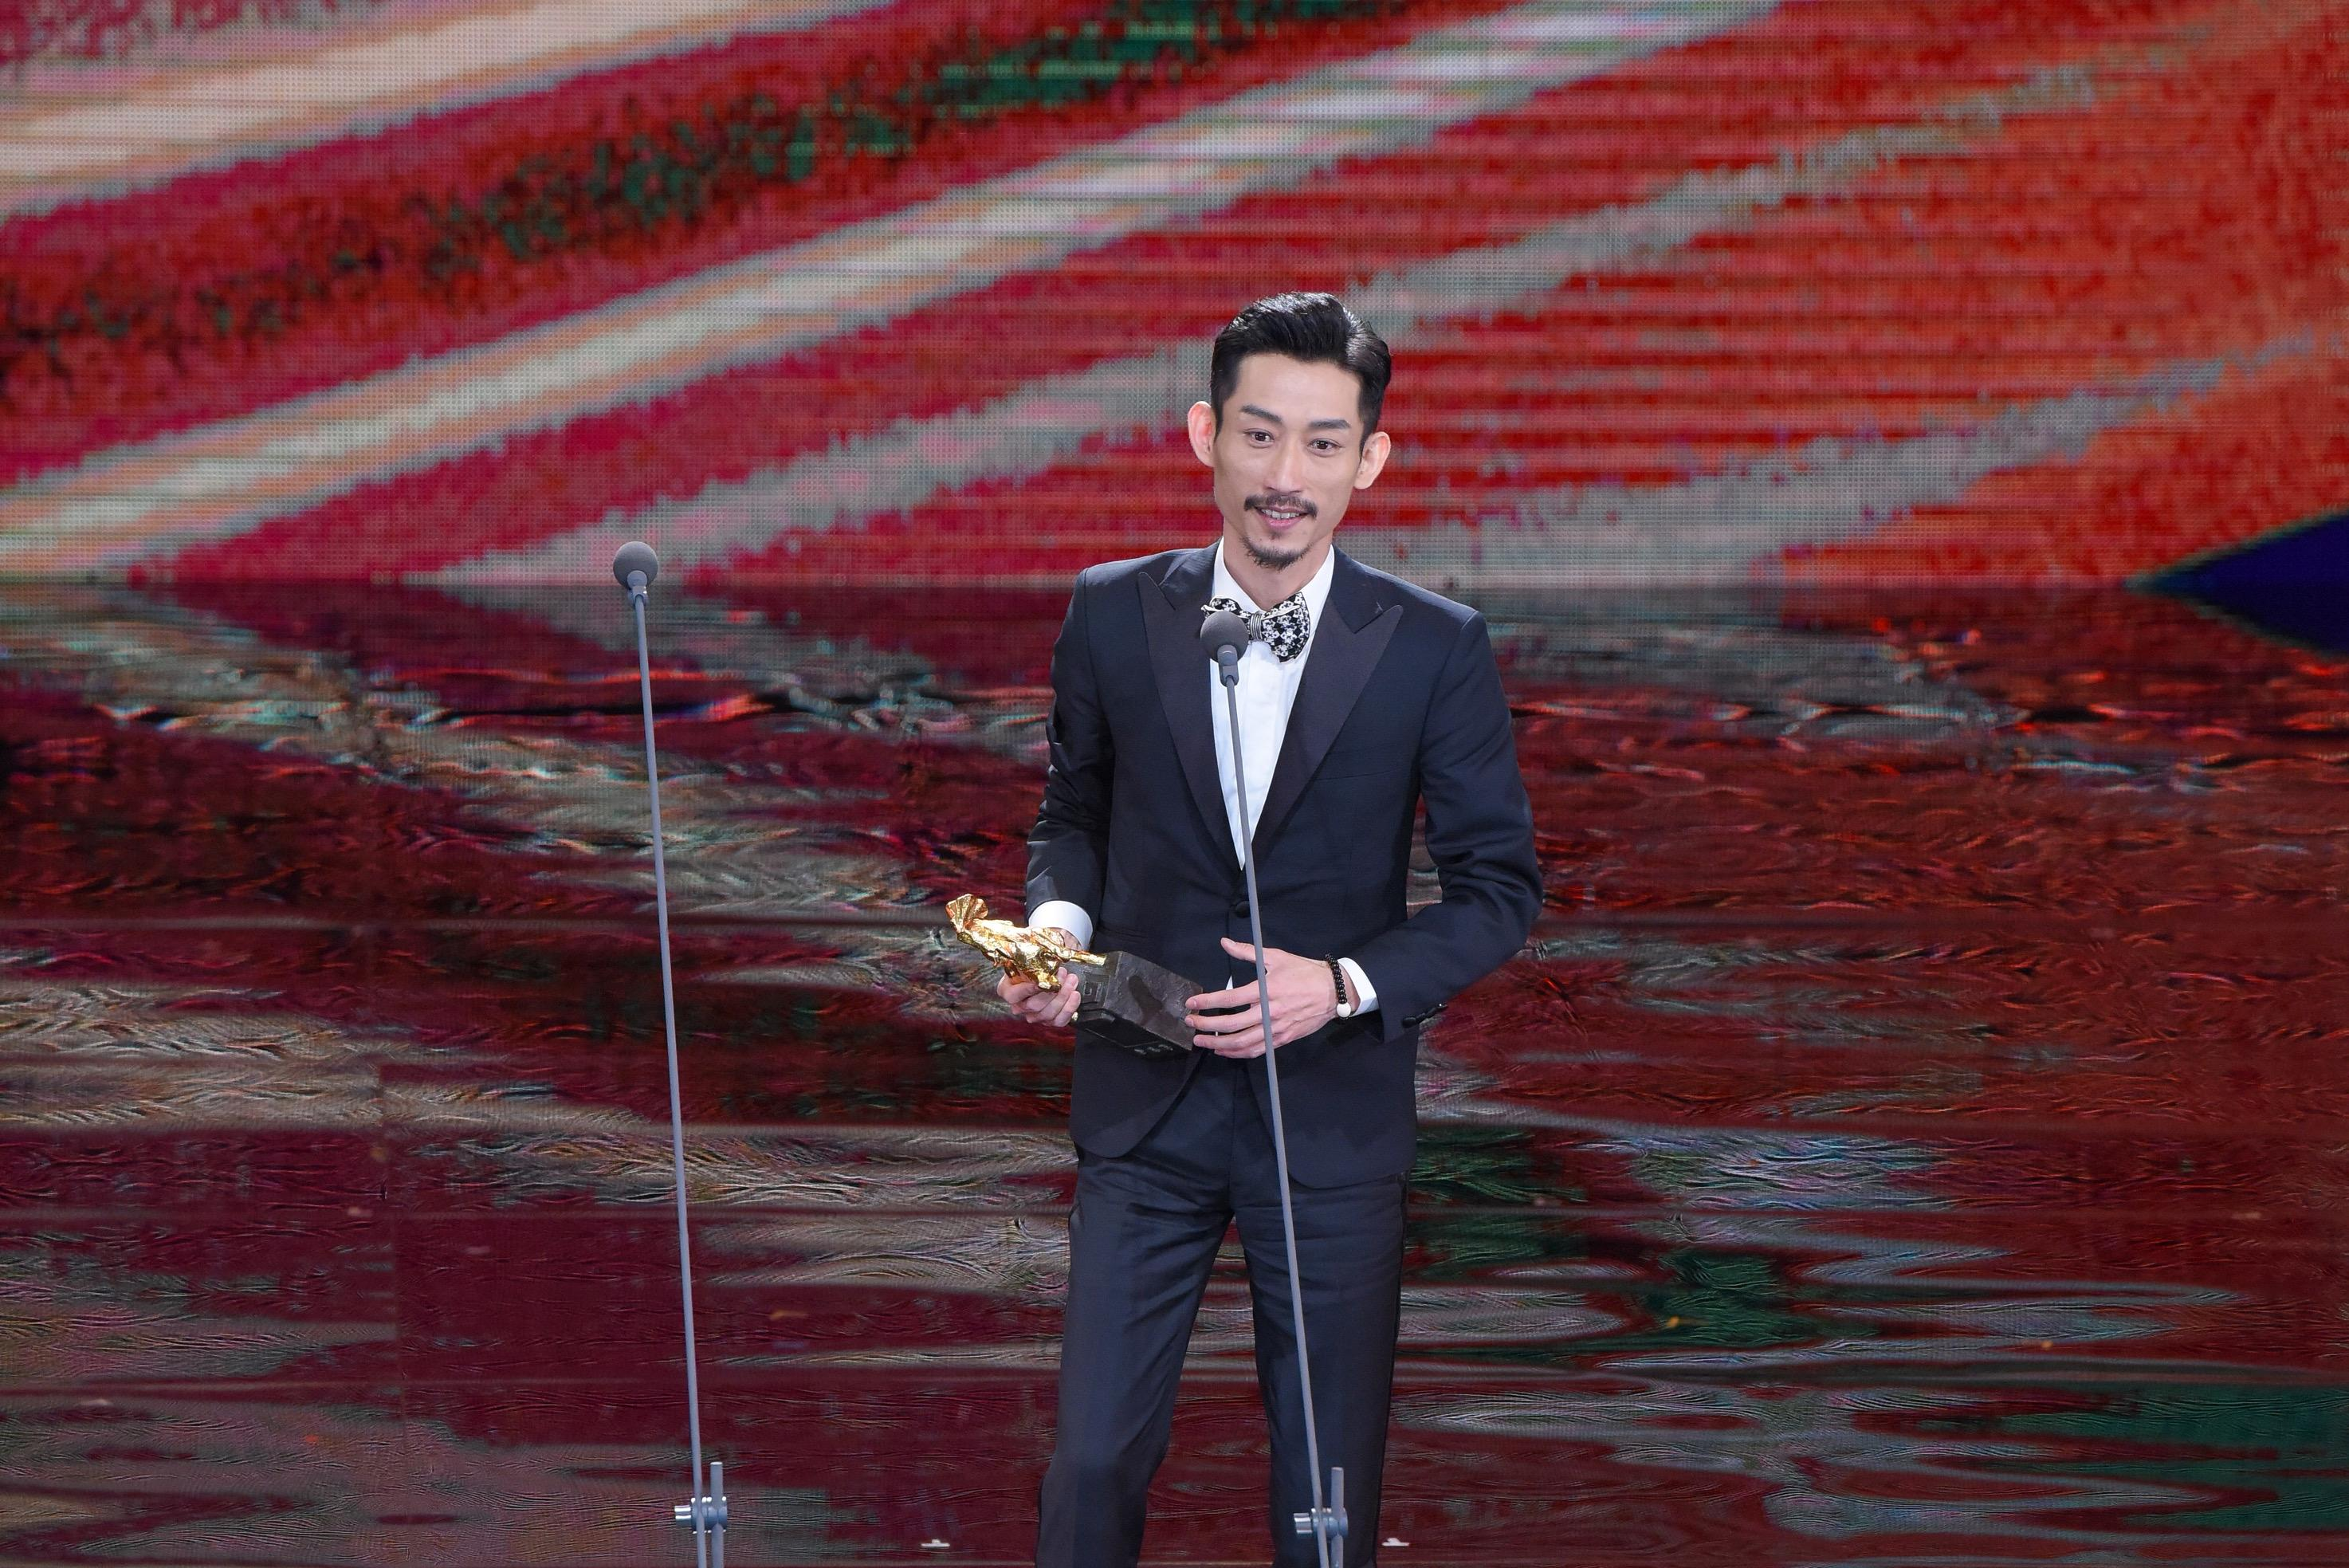 <p>第54屆金馬最佳男配角為《阿莉芙》陳竹昇,他激動上台從交好的林美秀手中領獎,還在台上對老婆深情告白「我愛你,沒有你,劇場的路不知道怎麼走。」(影像:金馬執委會提供) </p>